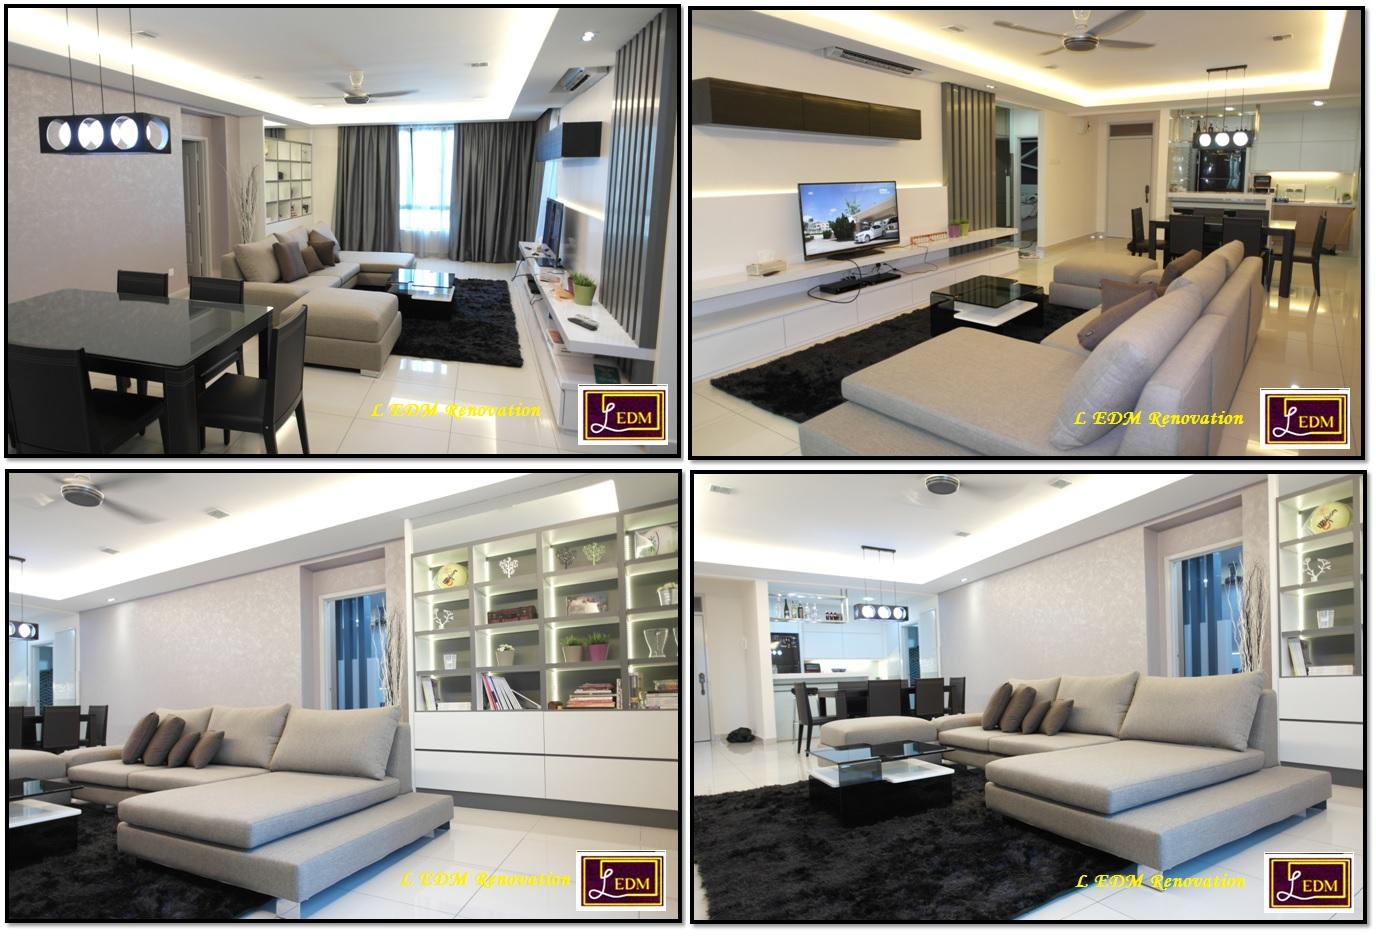 L Edm Renovation Puchong Atmosfera Year 2013 Residence